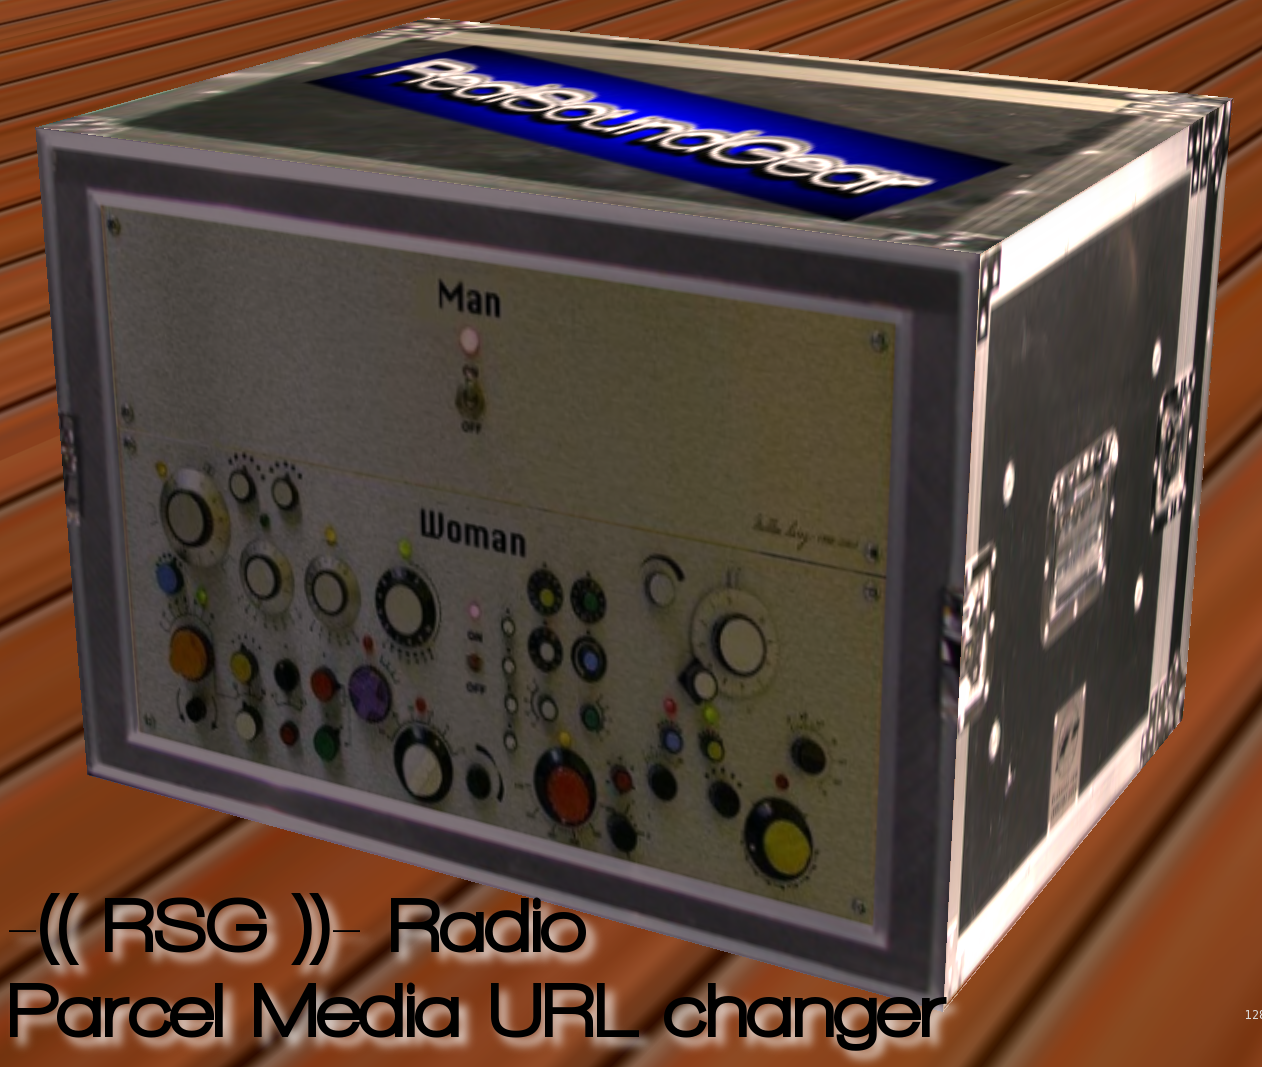 -(( RSG ))- parcel music URL changer